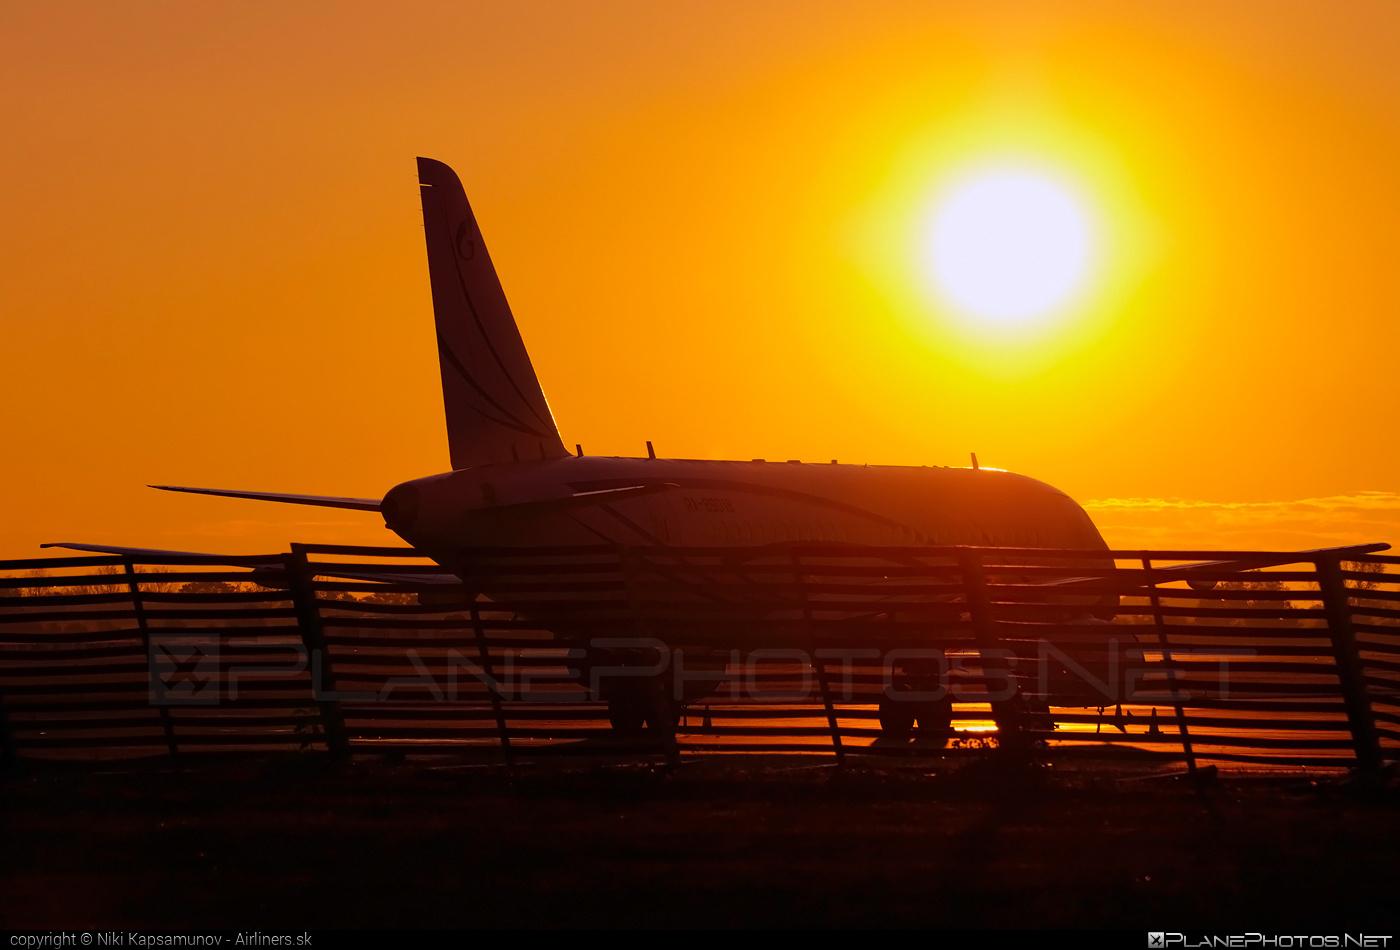 Sukhoi SSJ 100-95LR Superjet - RA-89018 operated by Gazpromavia #ssj100 #ssj10095lr #sukhoi #sukhoisuperjet #superjet